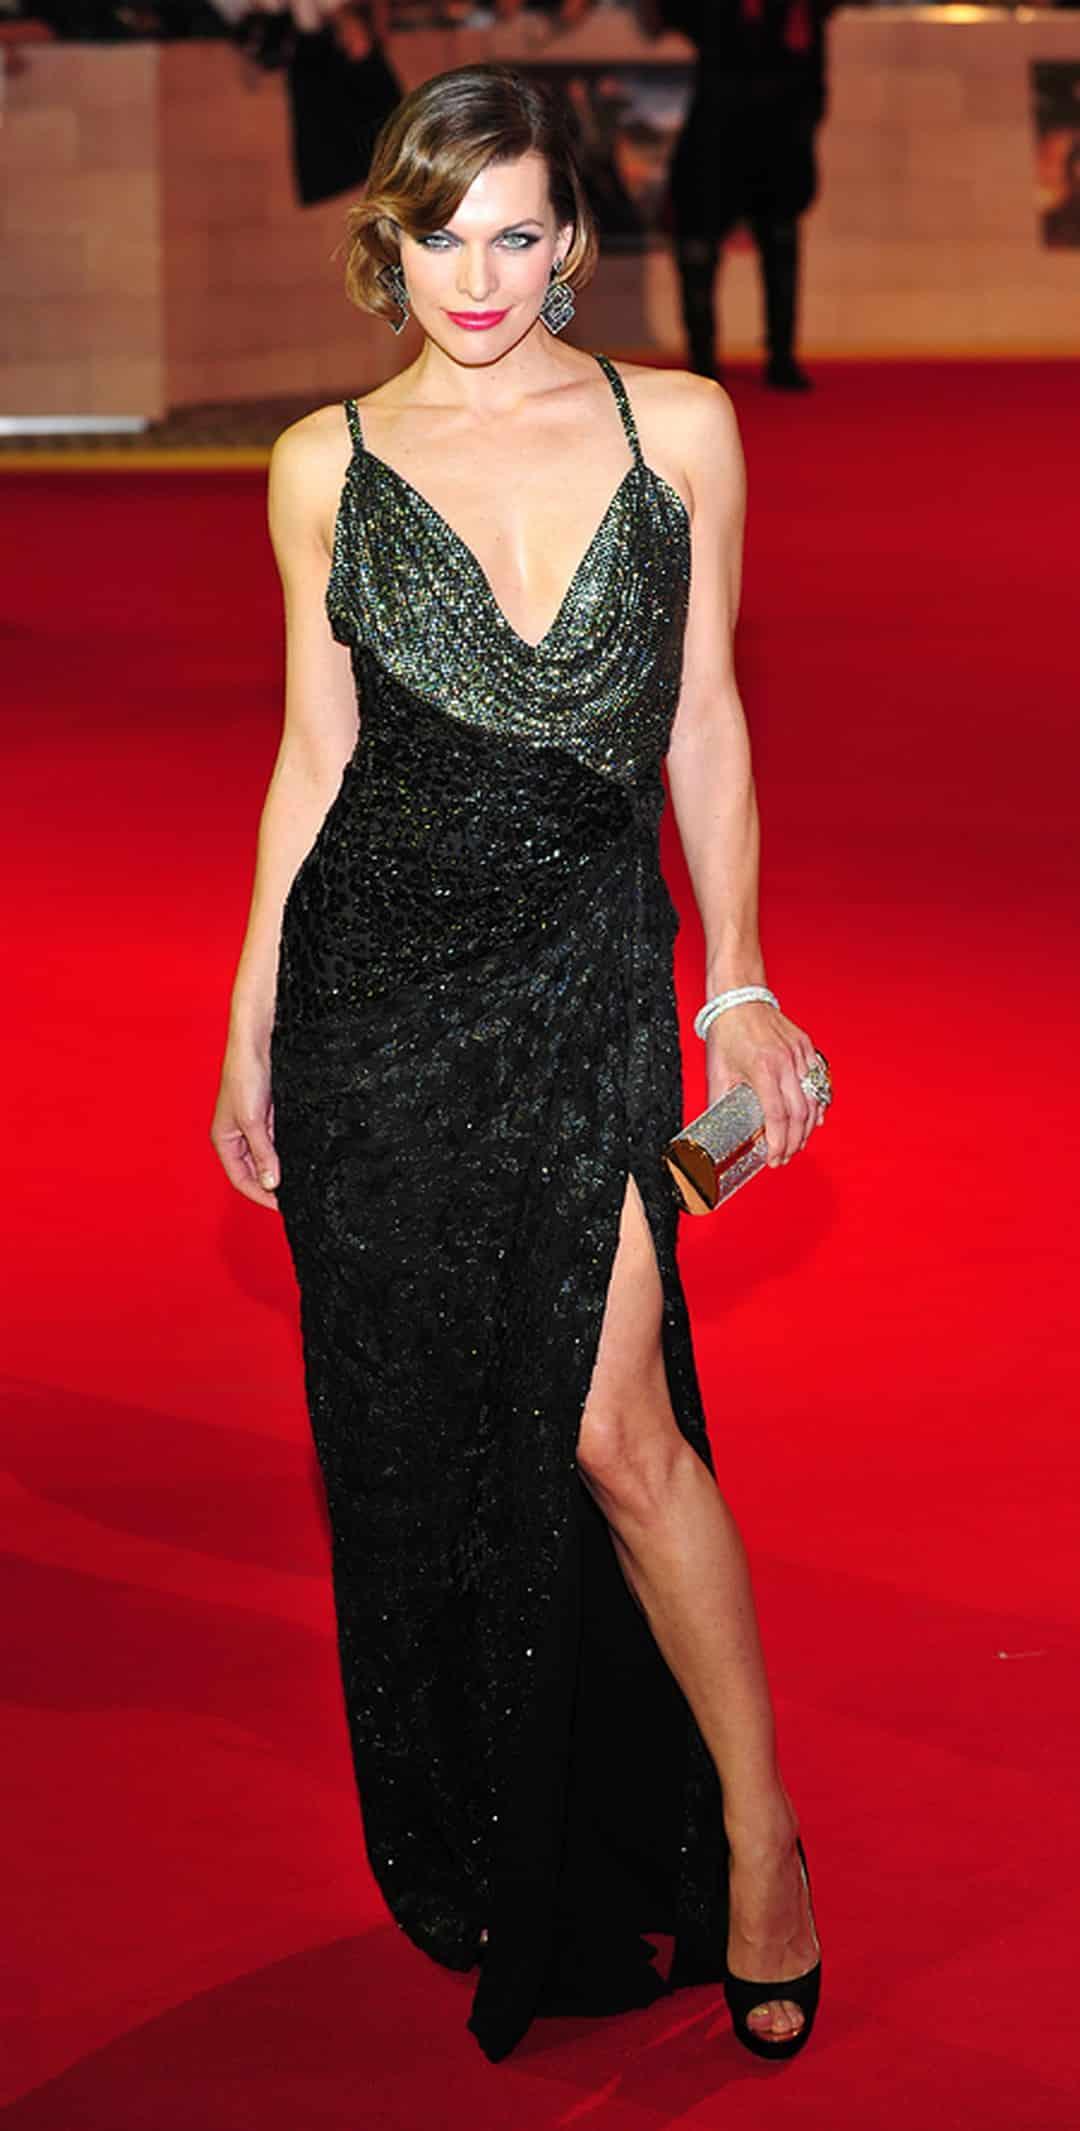 Mila Jovovich in a dress